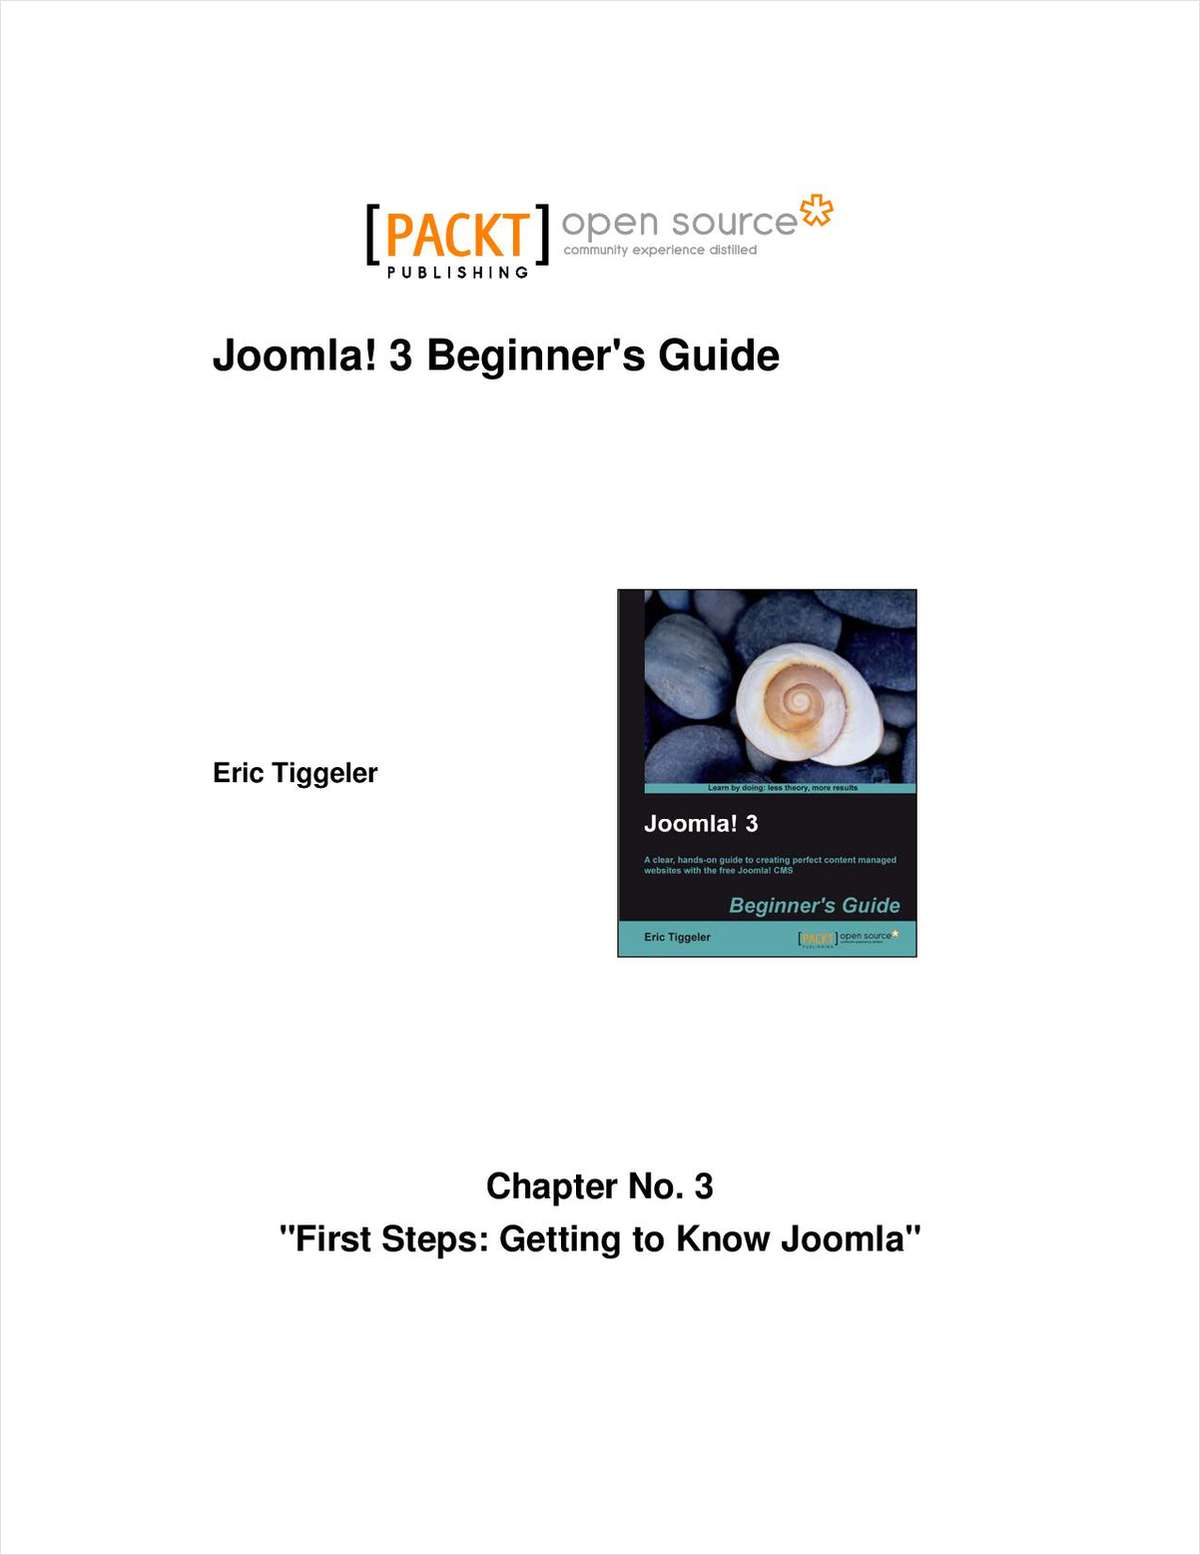 Joomla! 3 Beginner's Guide--Free 34 Page Excerpt